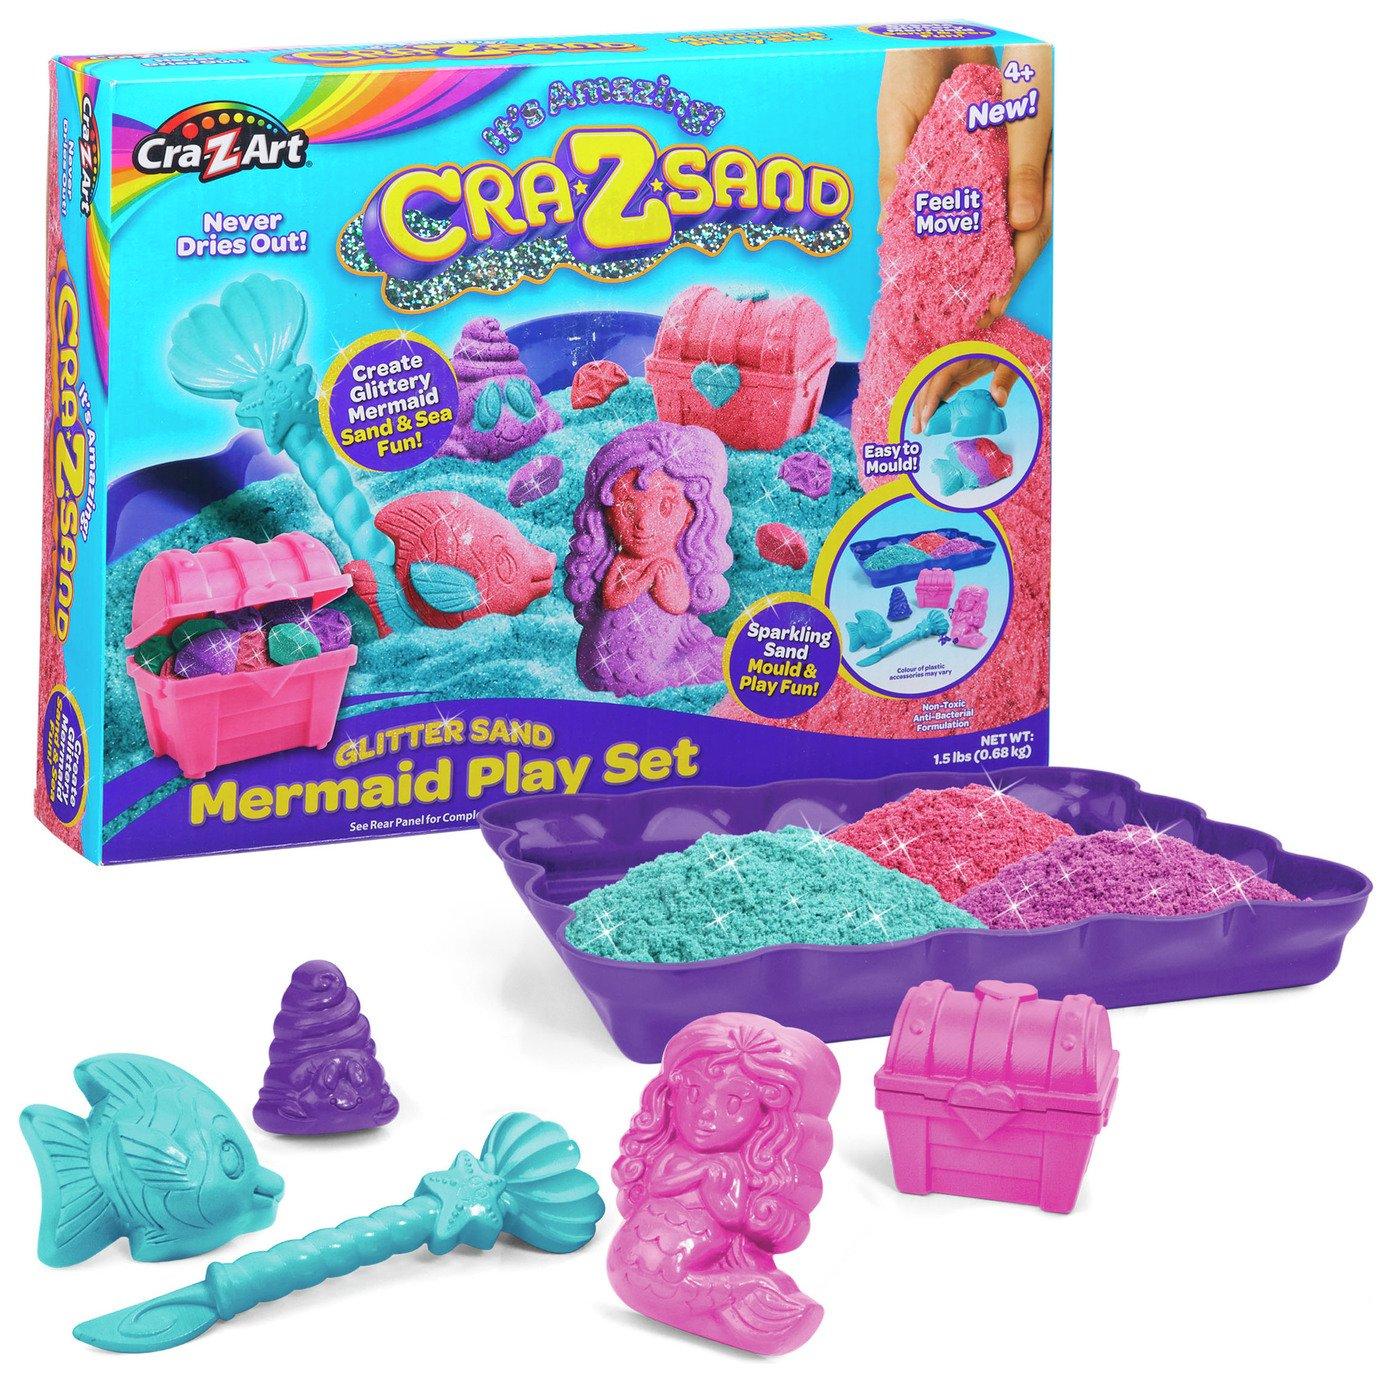 Image of Cra-Z-Sand Mermaid Playset